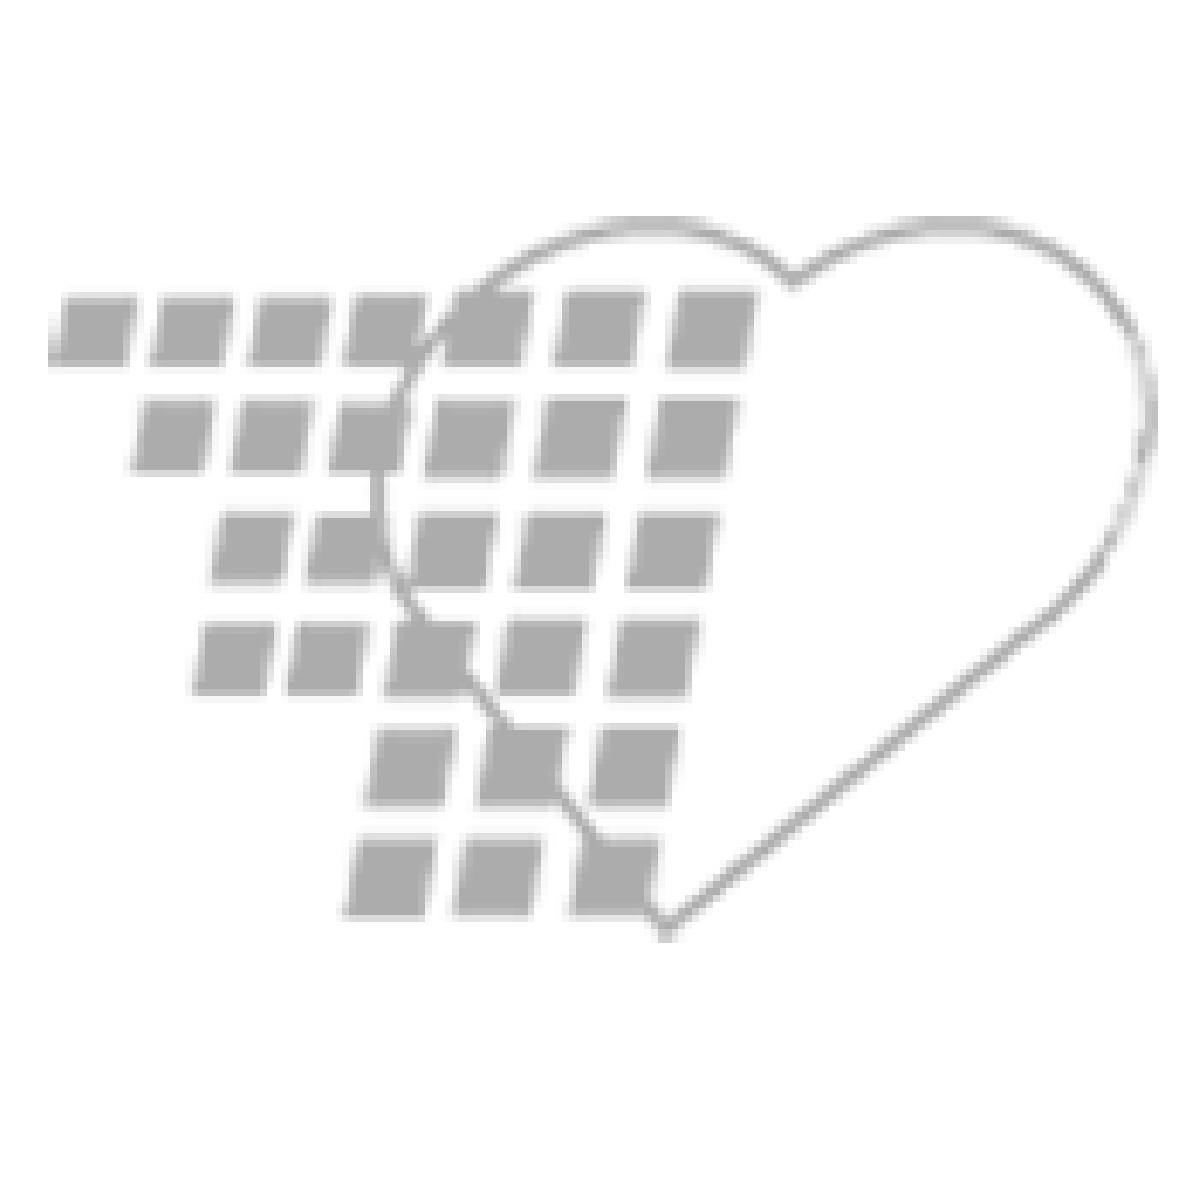 02-43-9251 Burdick 4250 Digital Holter Recorder (English)